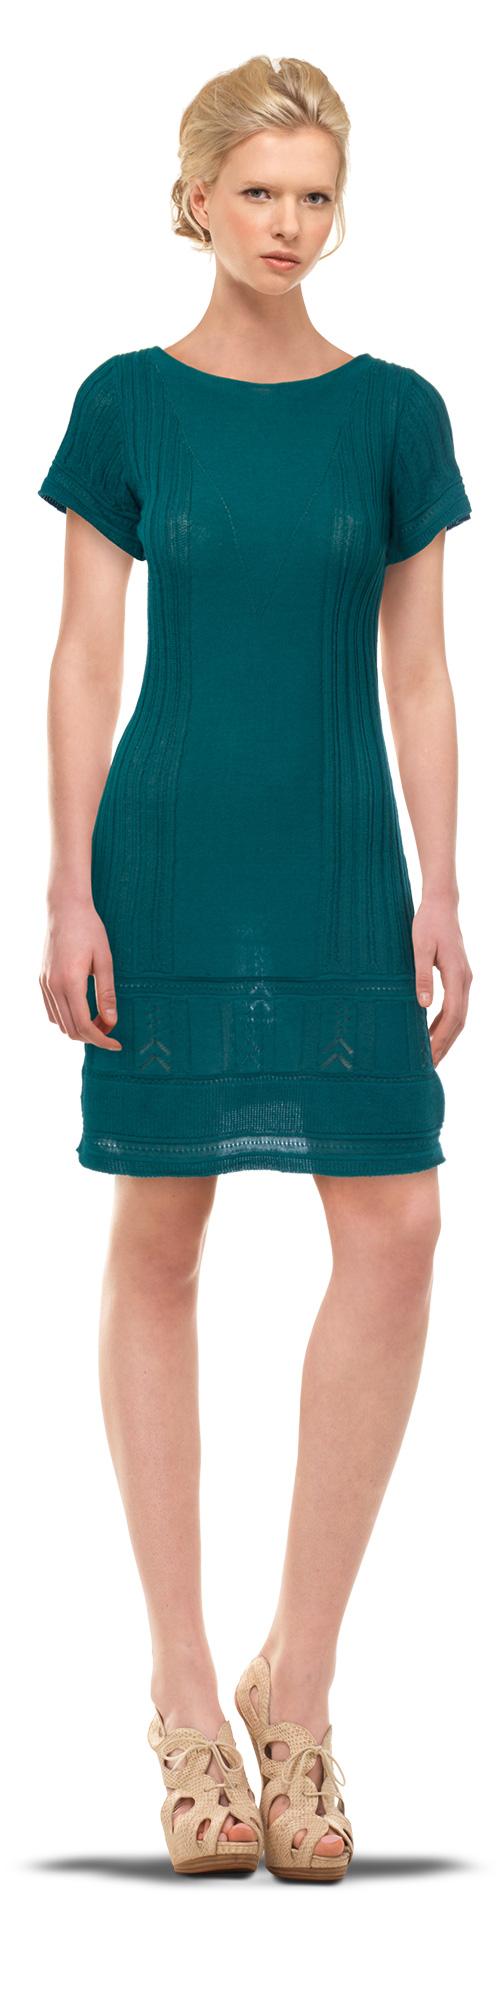 Cap Sleeved Sweater Dress $128